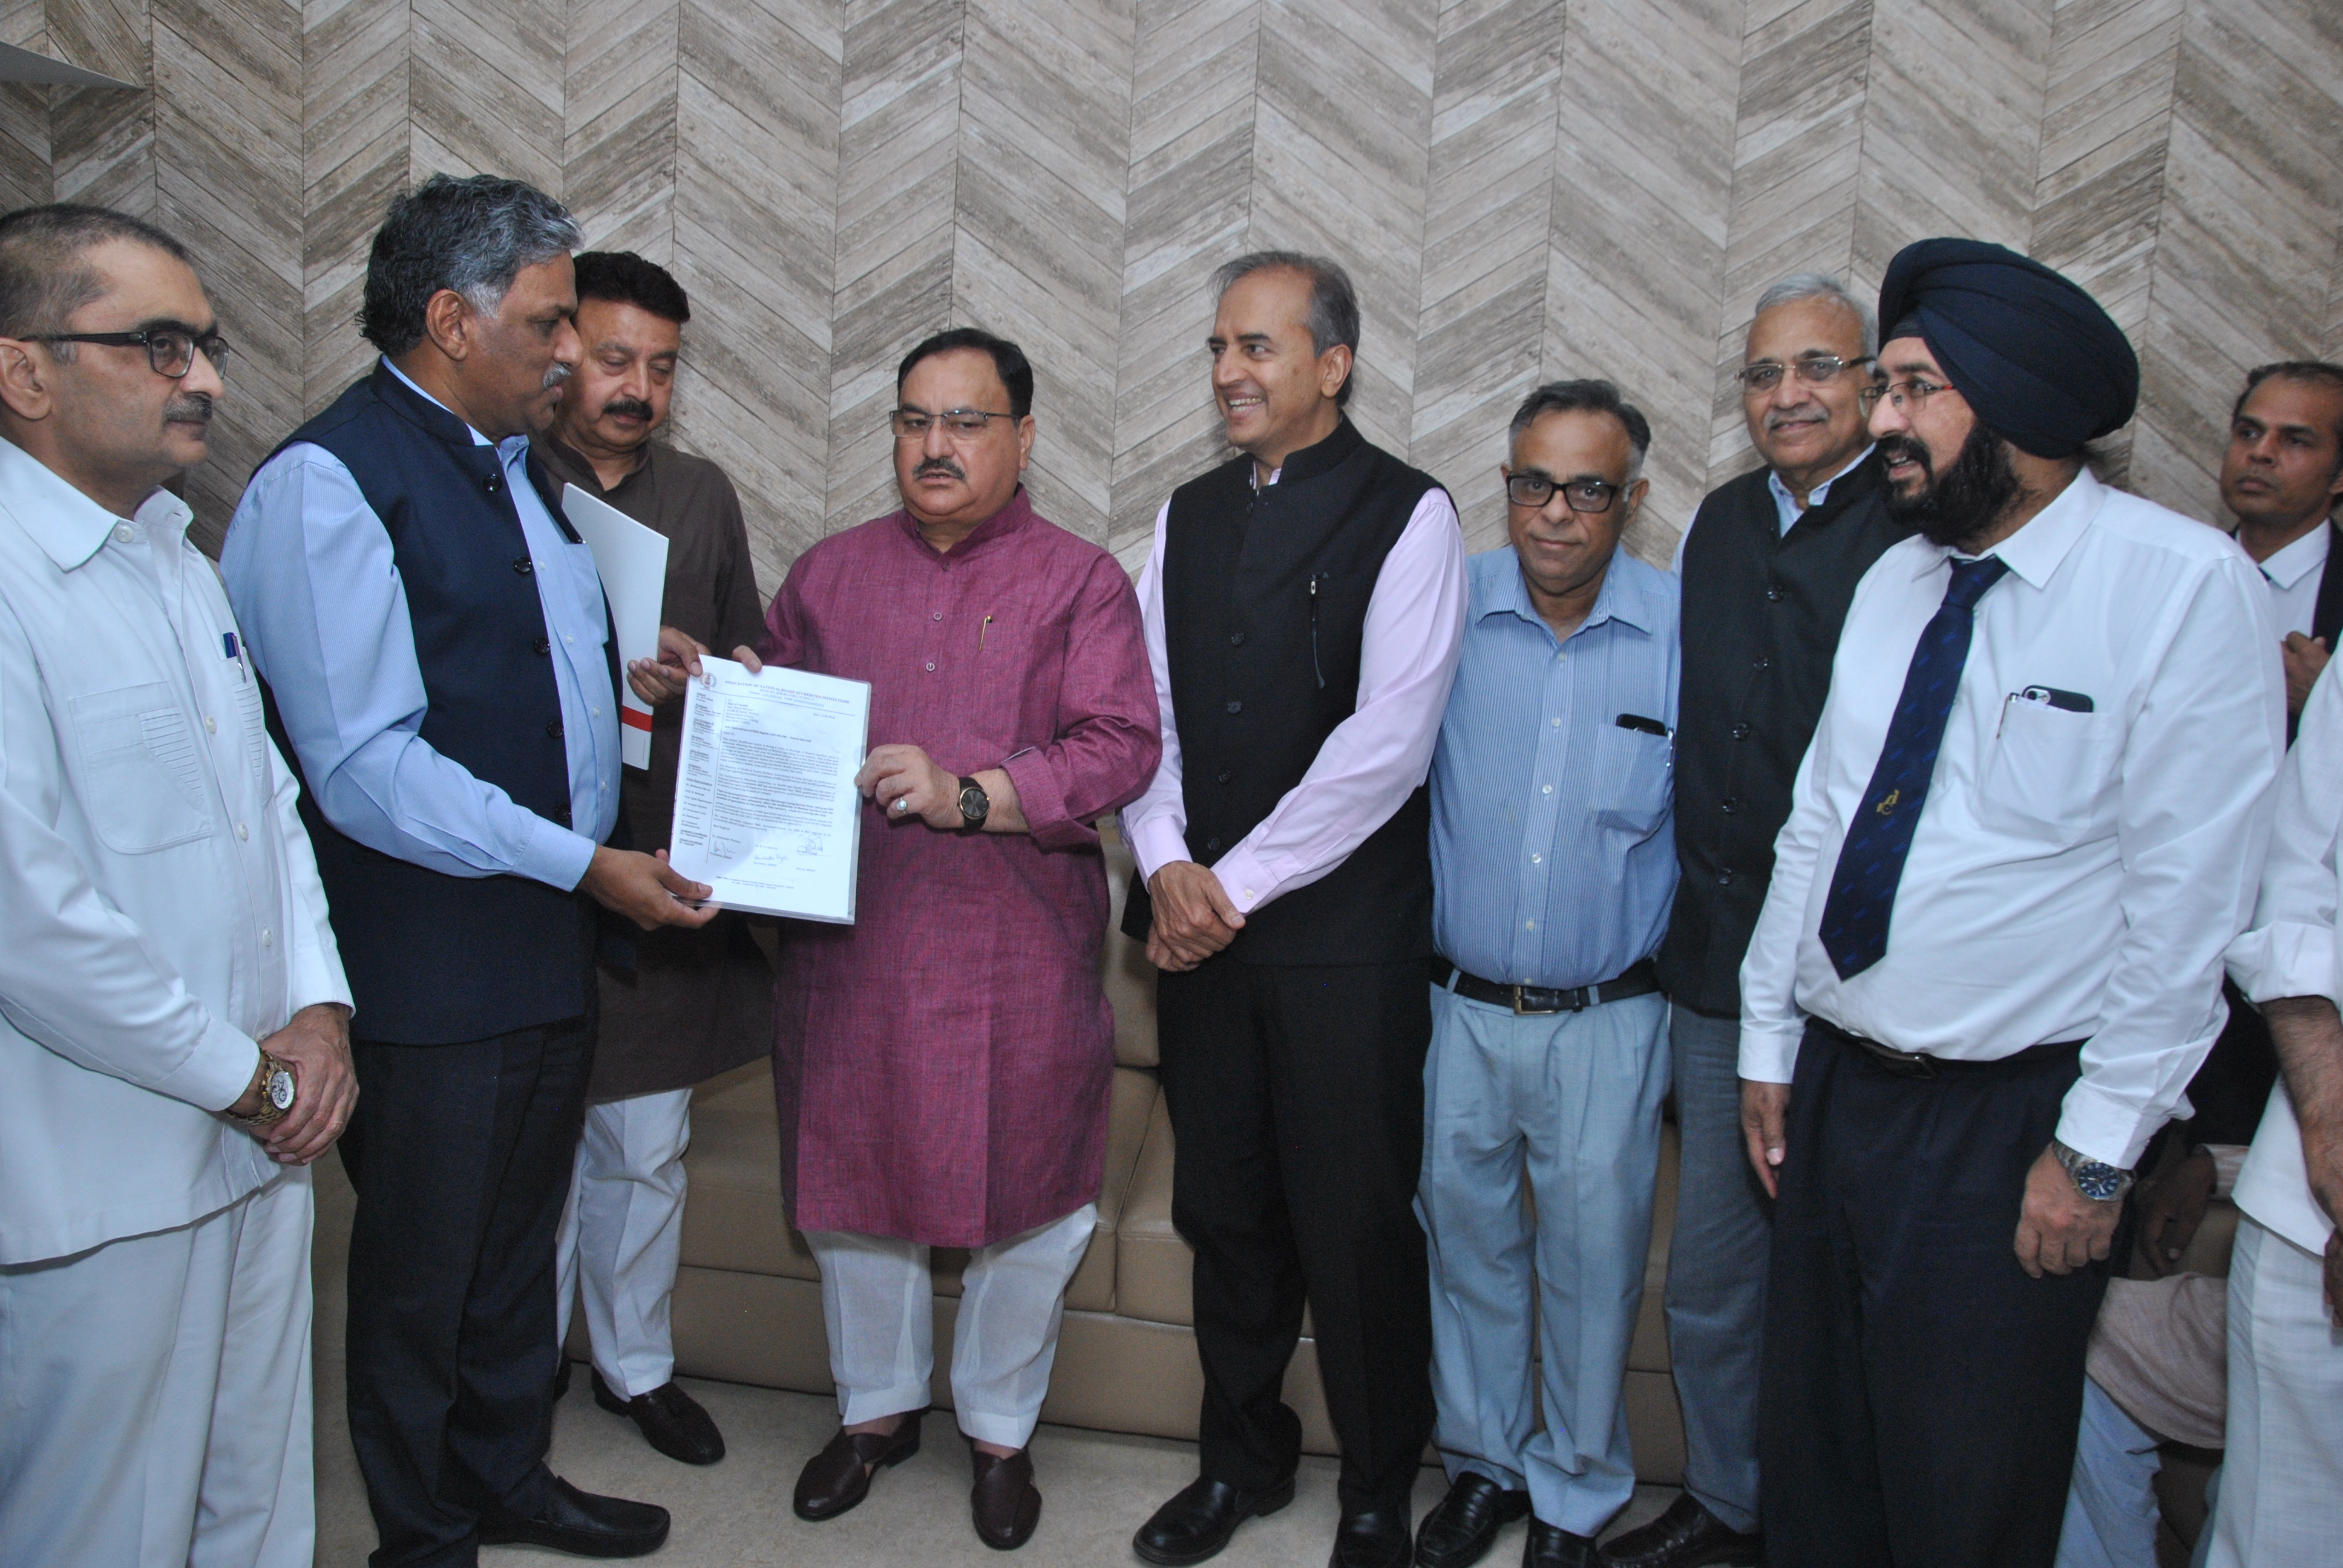 ANBAI officials Meet Health Ministry: Nadda Assures MD-DNB equivalence